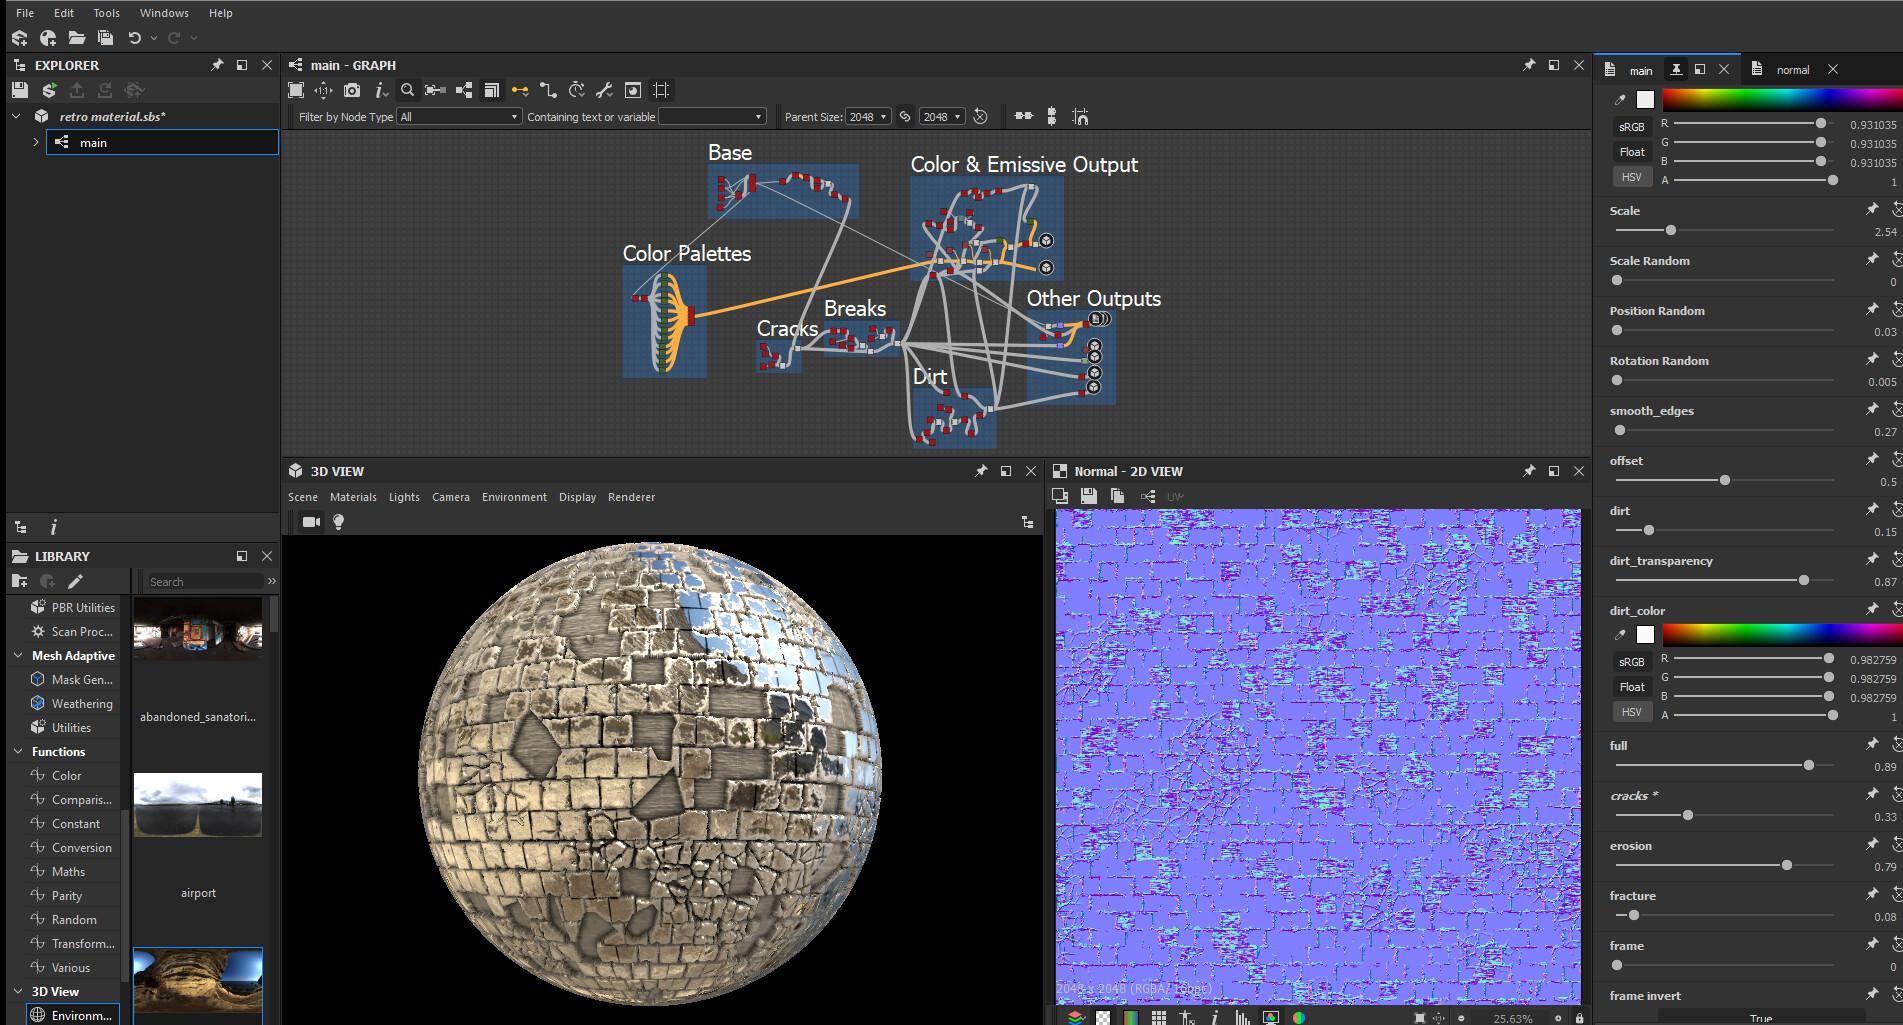 node graph of the disco material 🕺